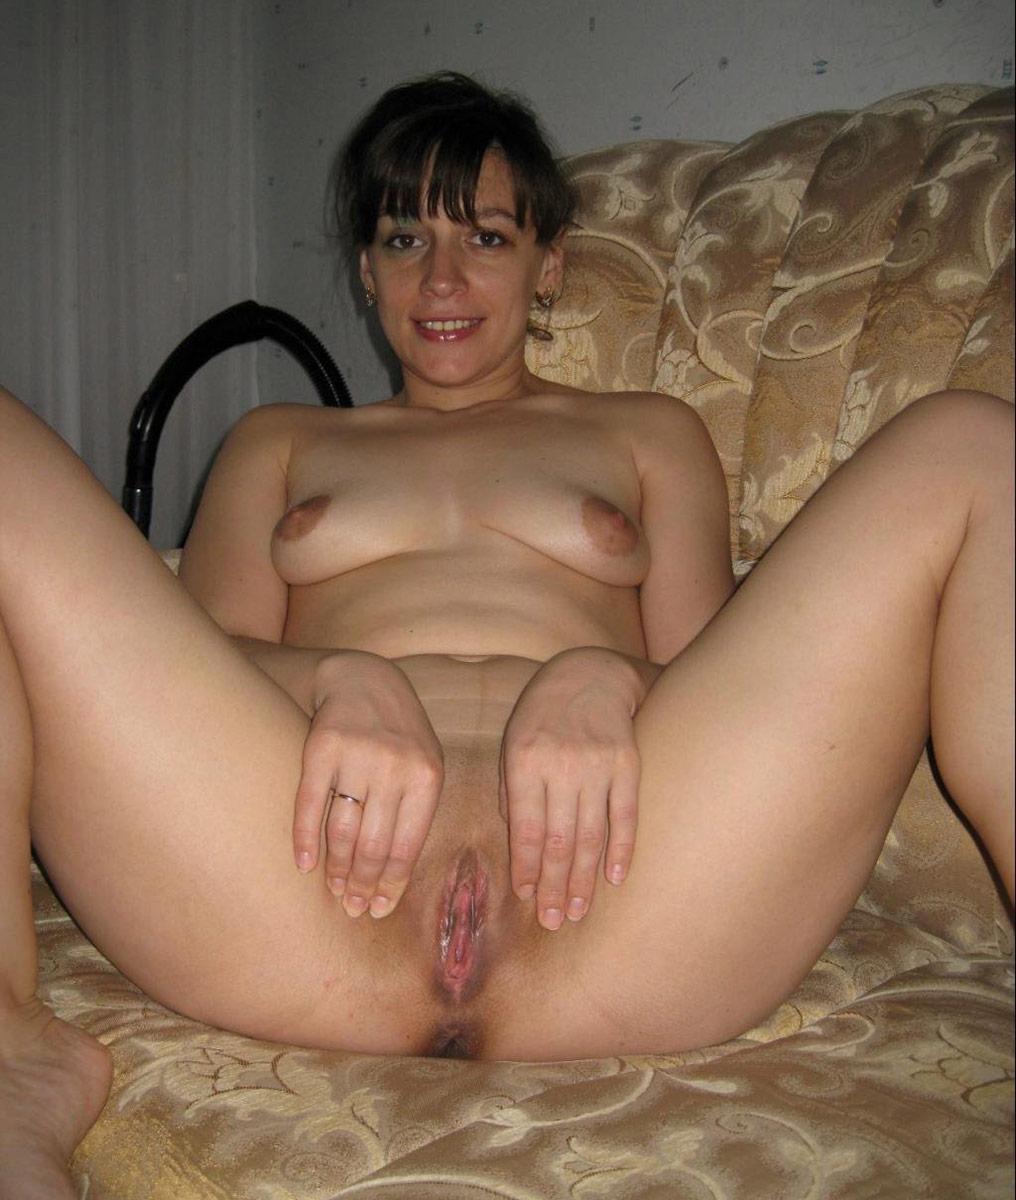 shaved bbw latina pussy